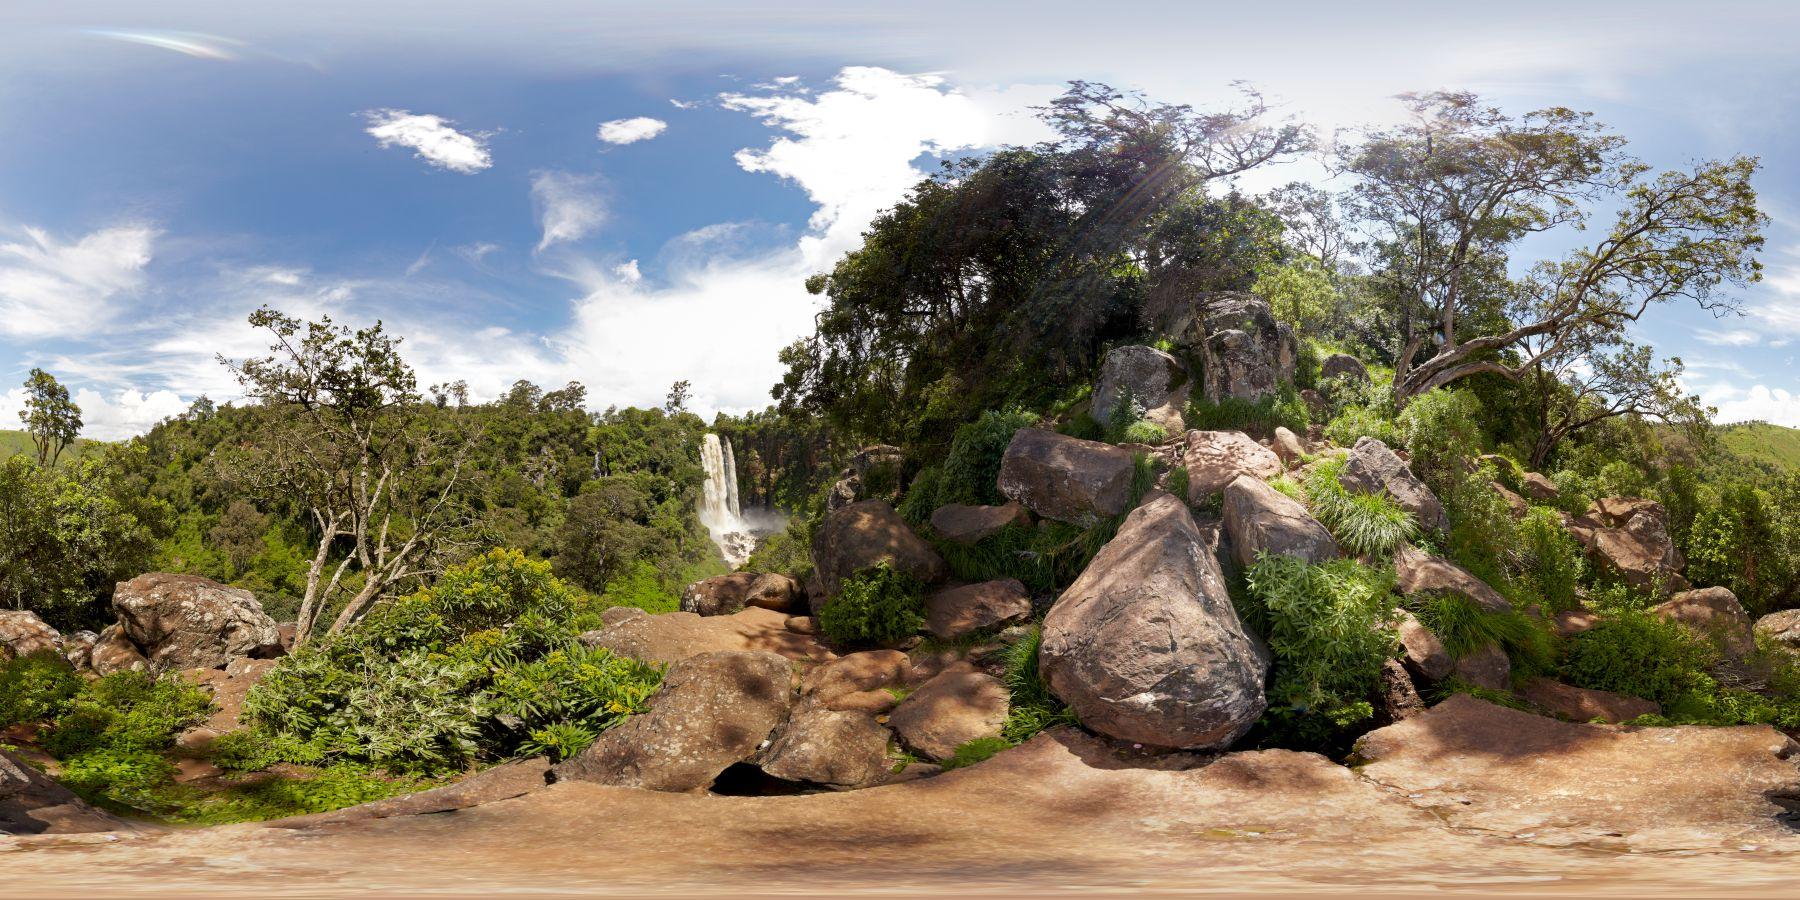 Panorama Kenia Thompson_Wasserfall 4